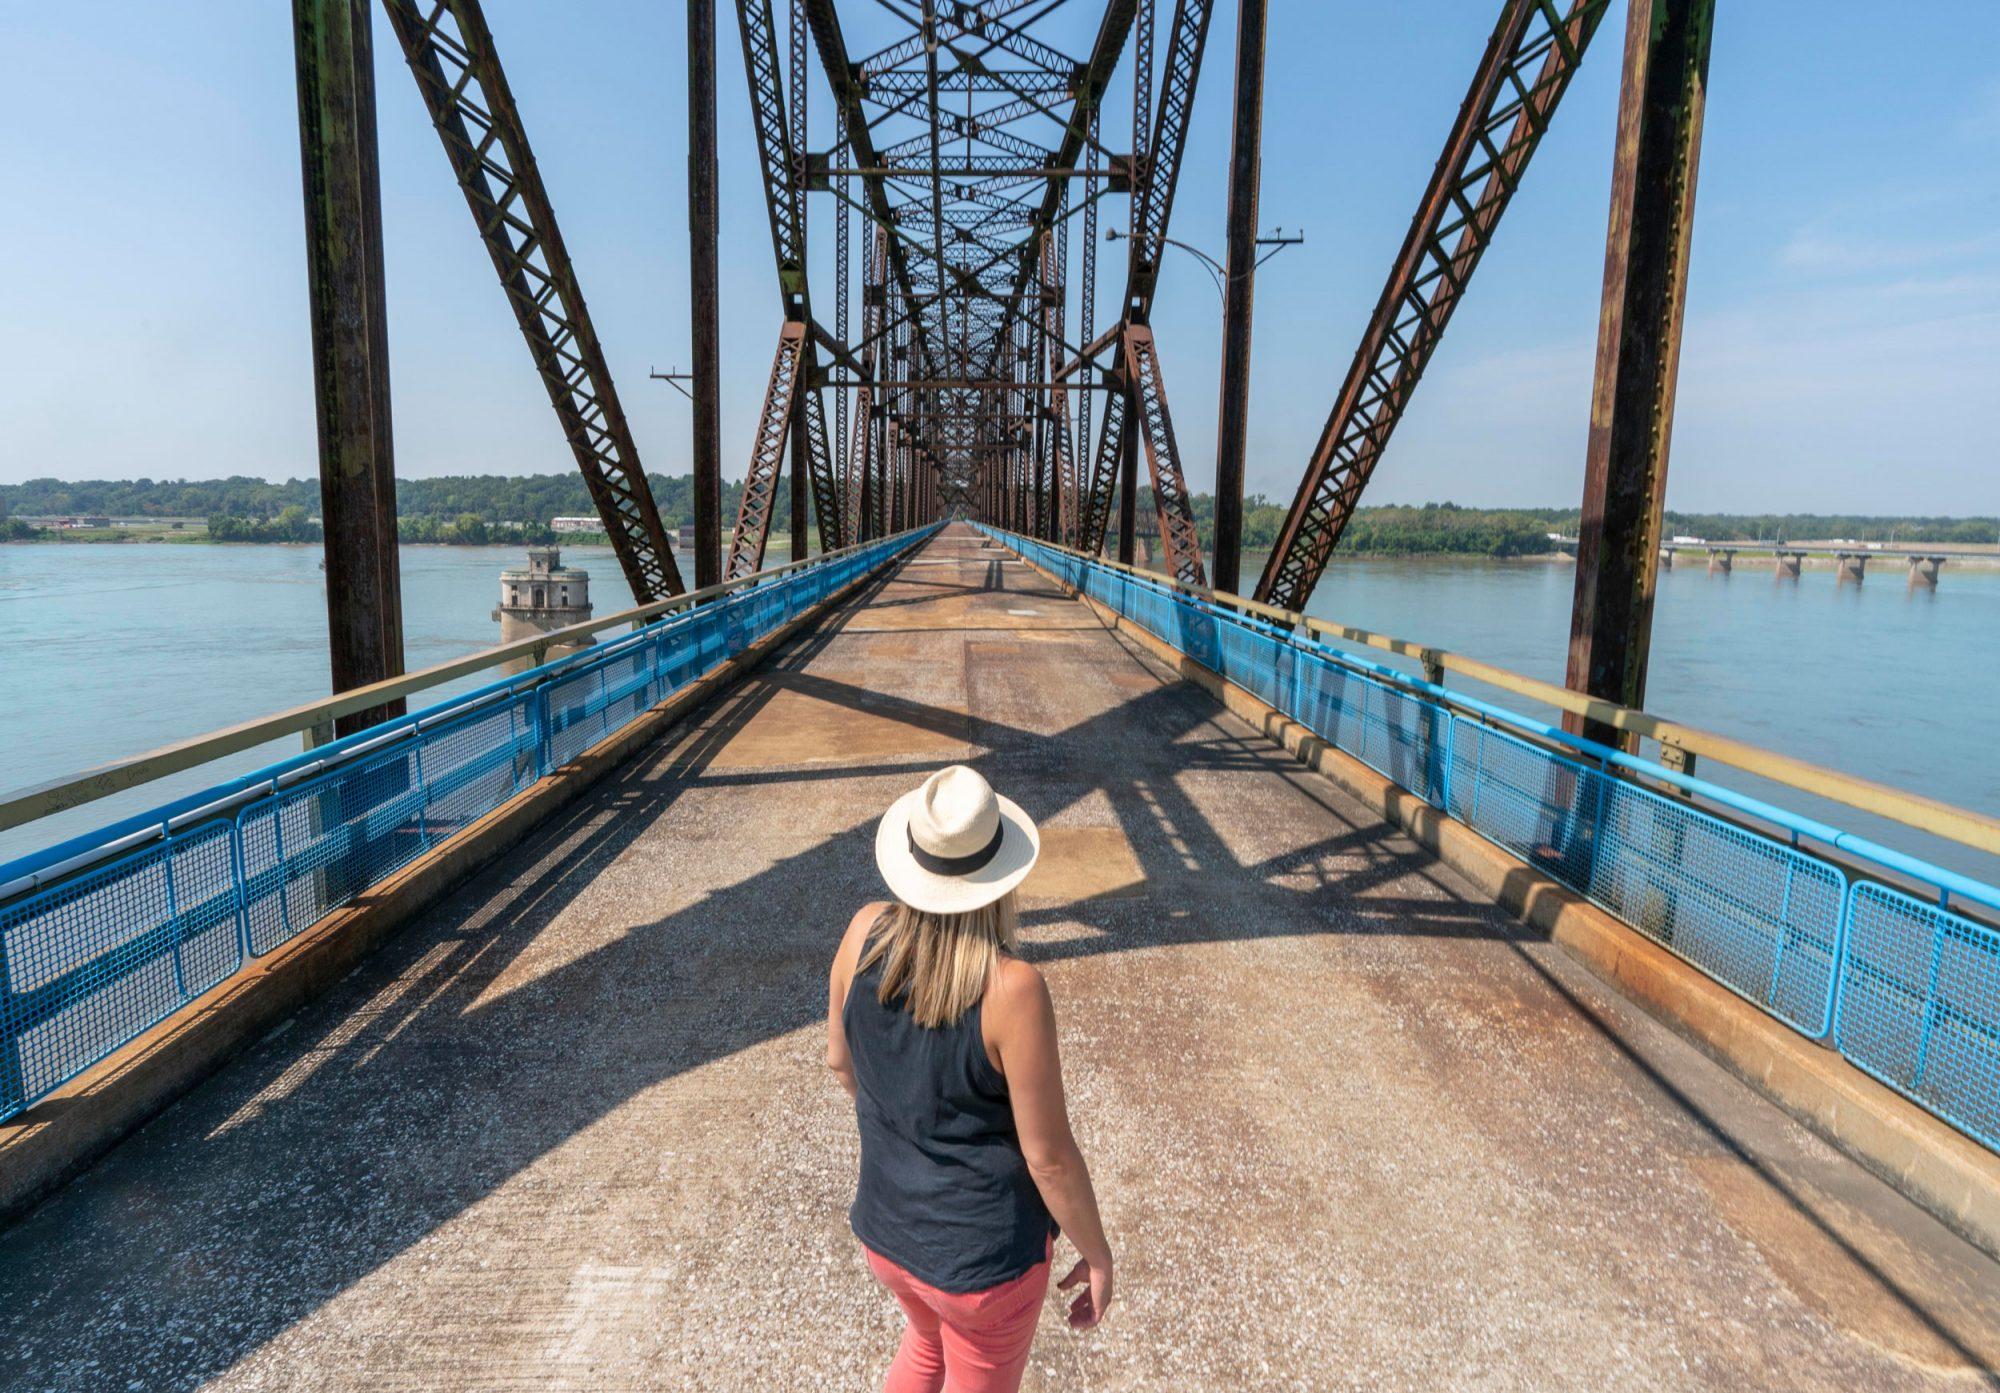 Old Chain of Rocks Bridge, Chouteau island